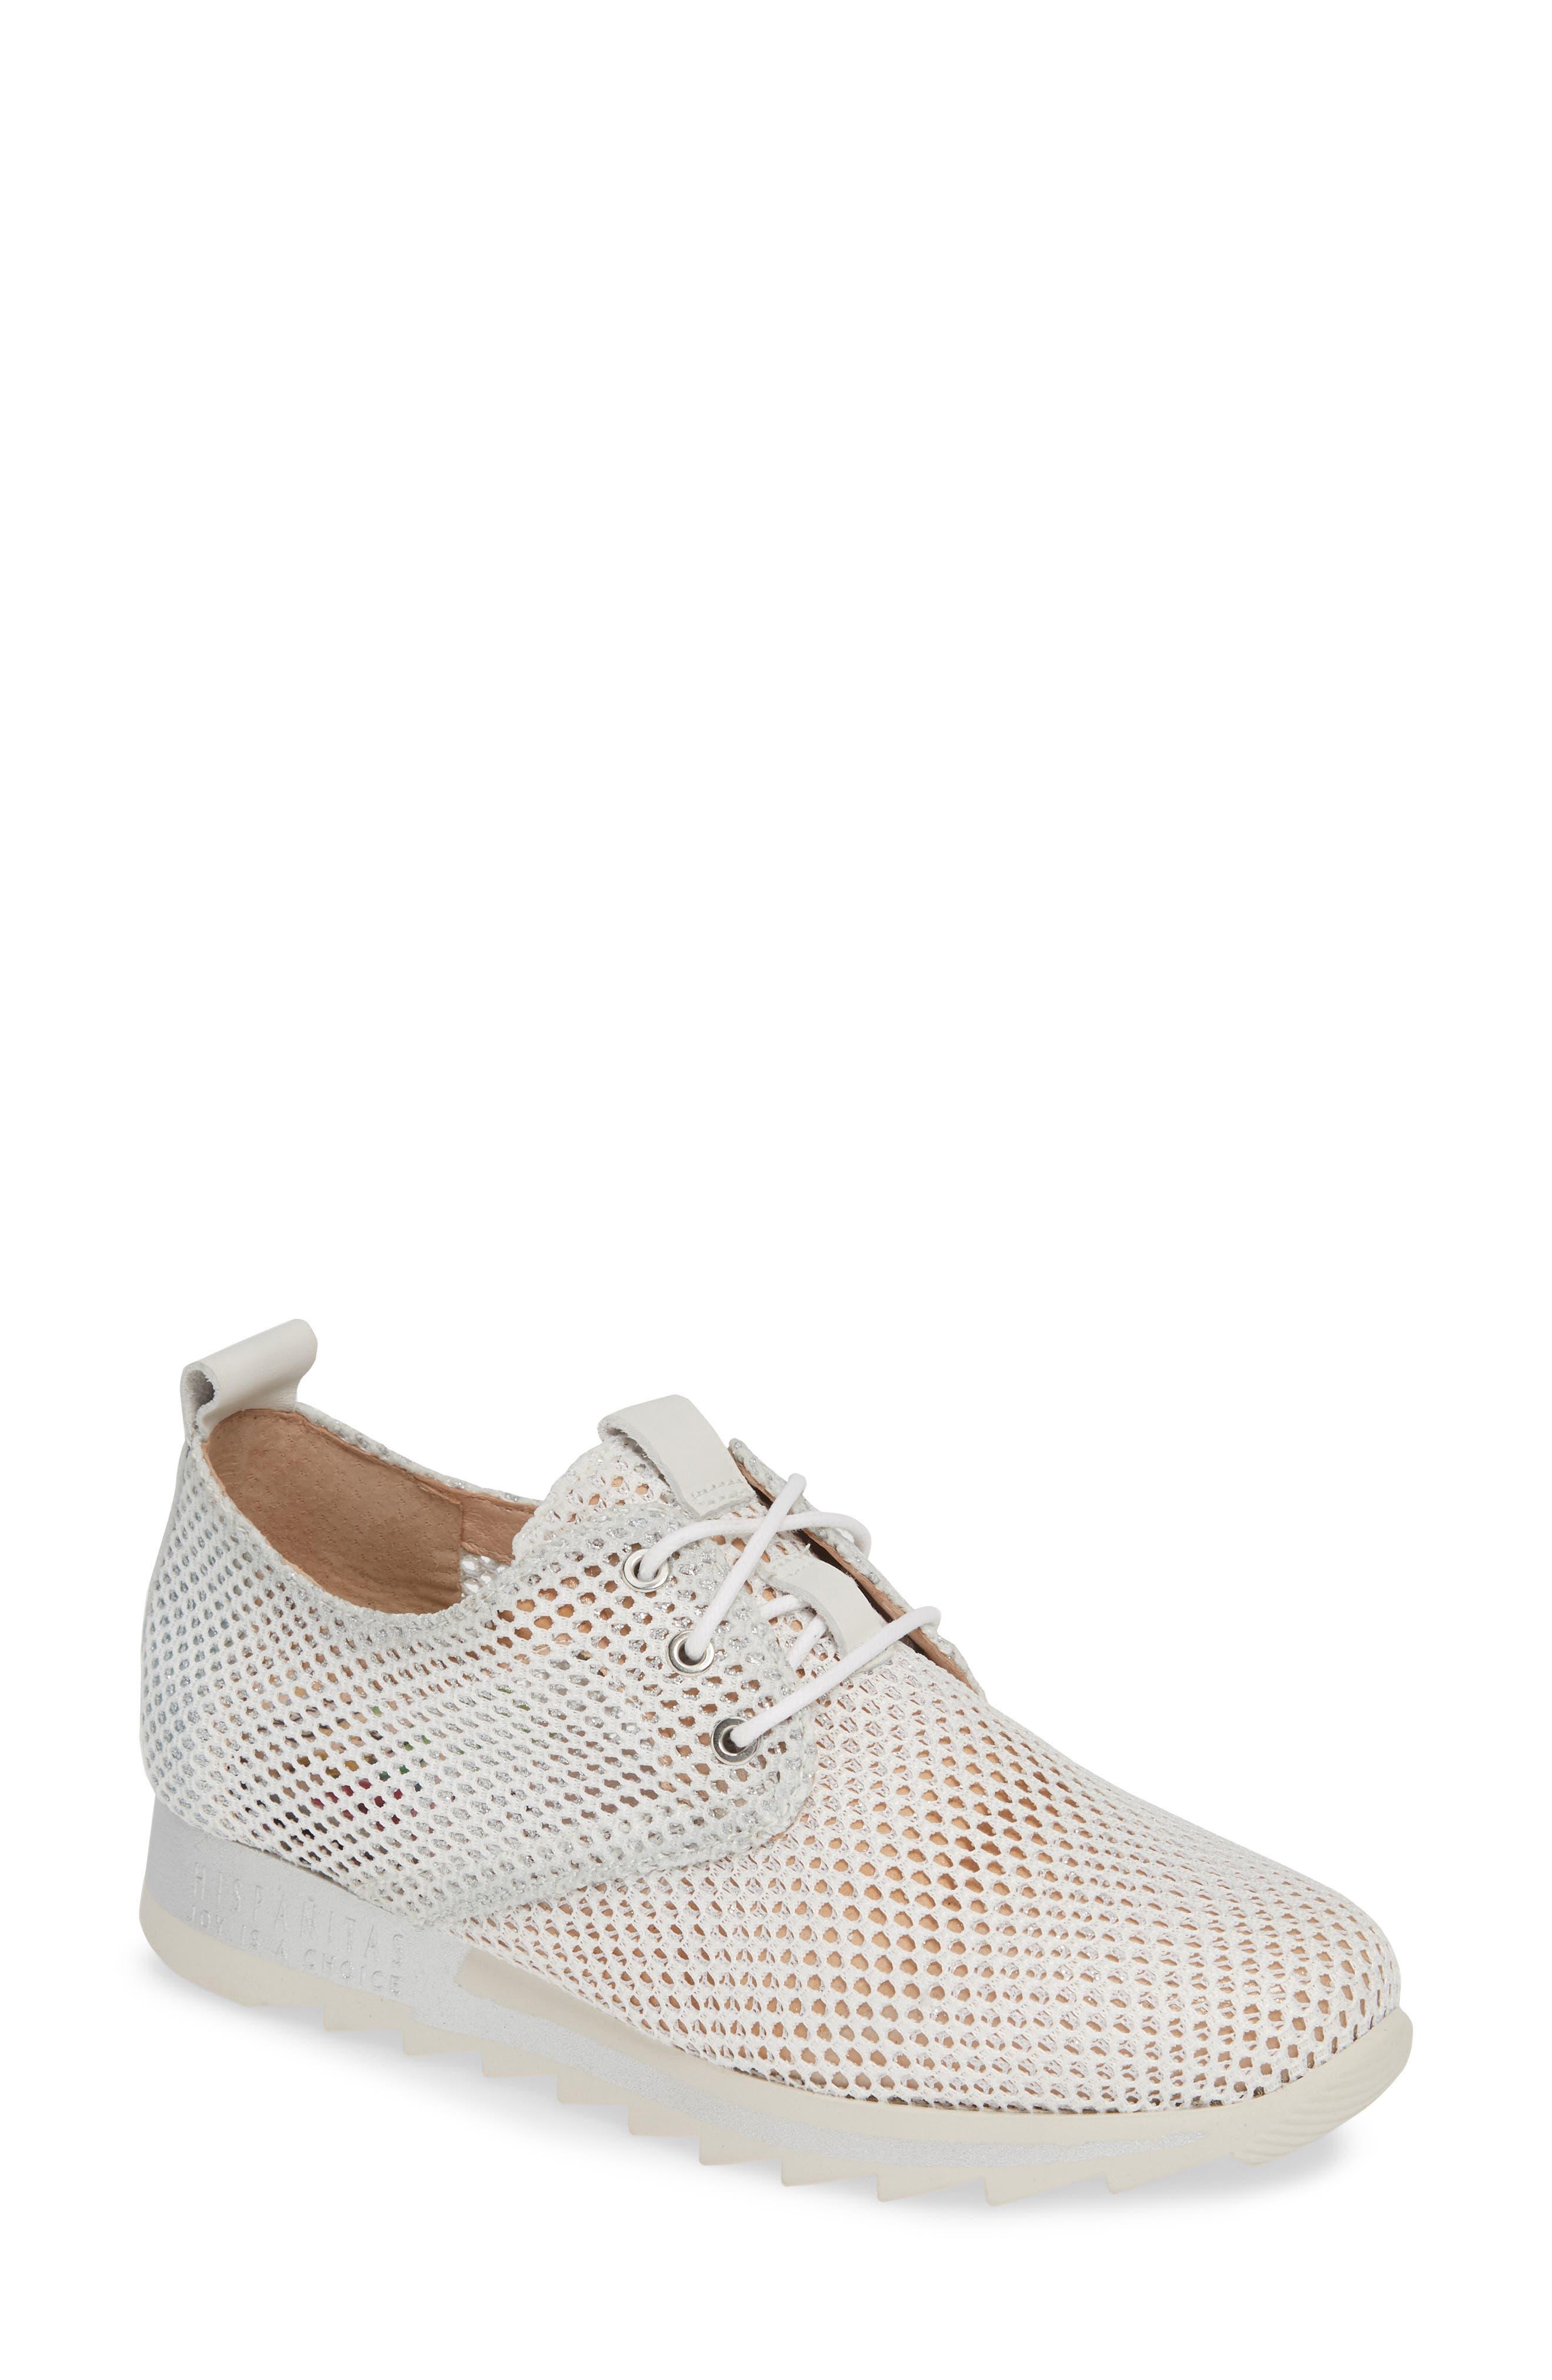 HISPANITAS Babe Mesh Sneaker, Main, color, ROBERTA BLANCO LEATHER